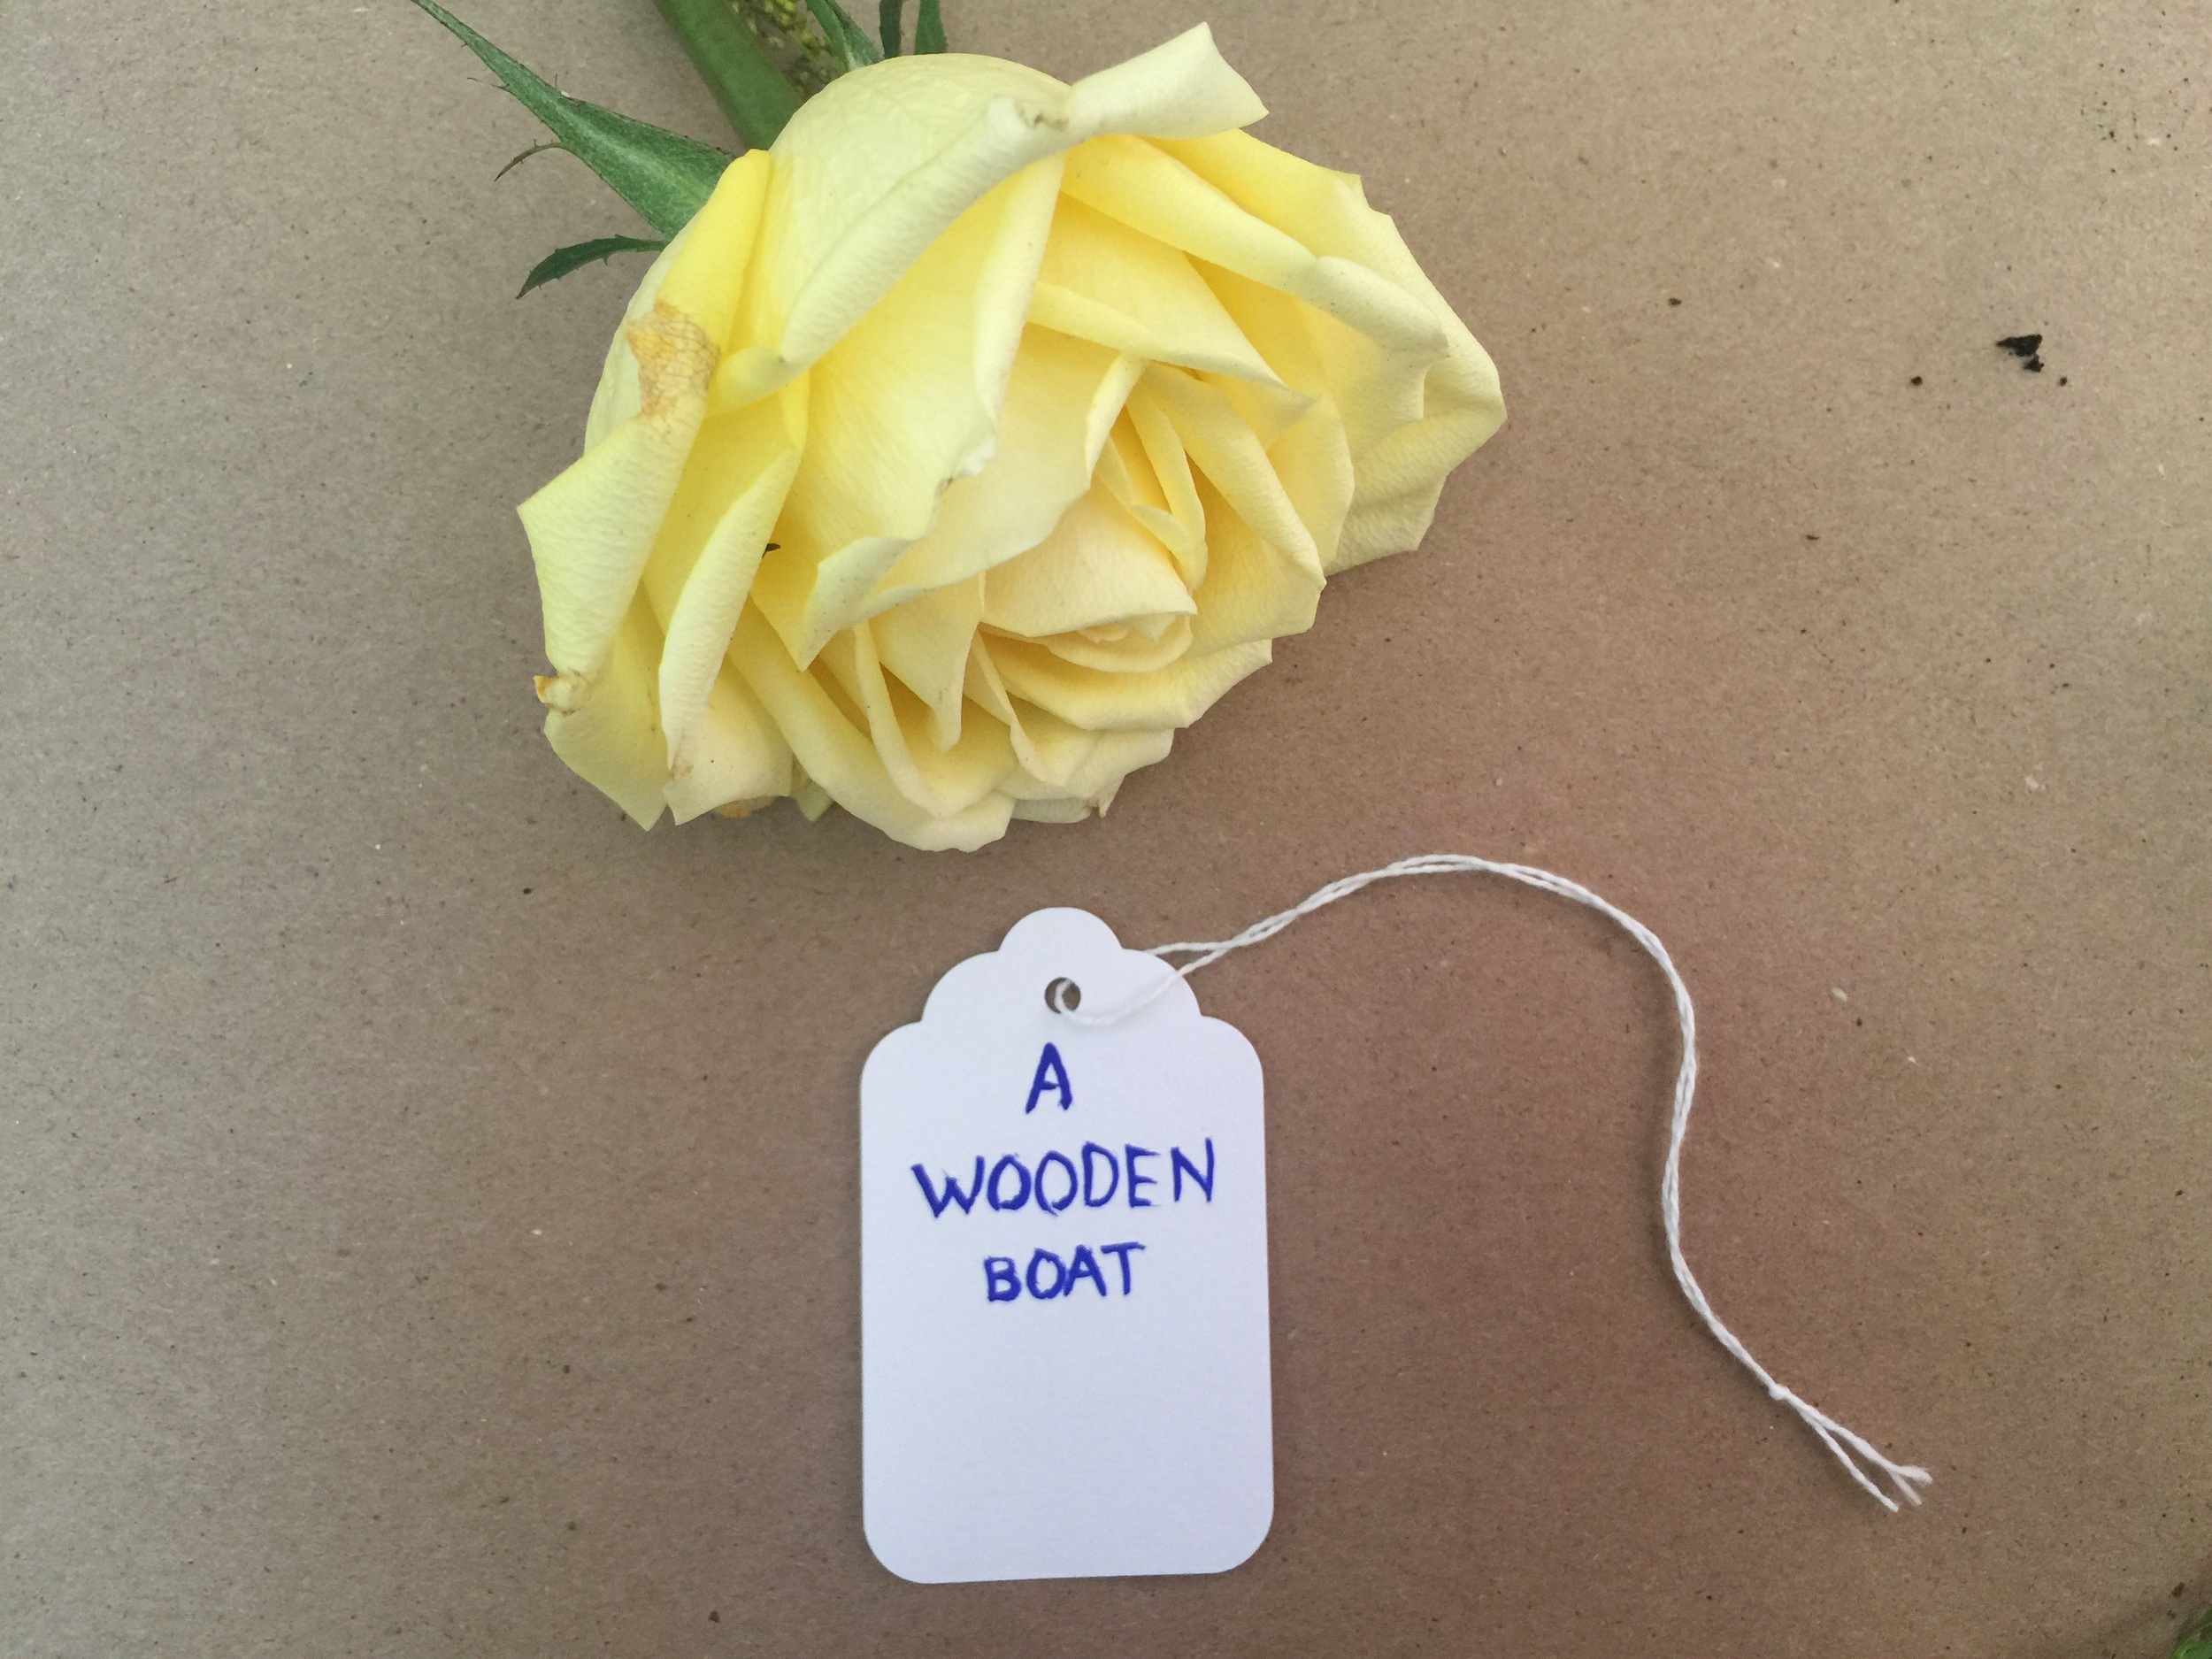 a wooden boat.jpg